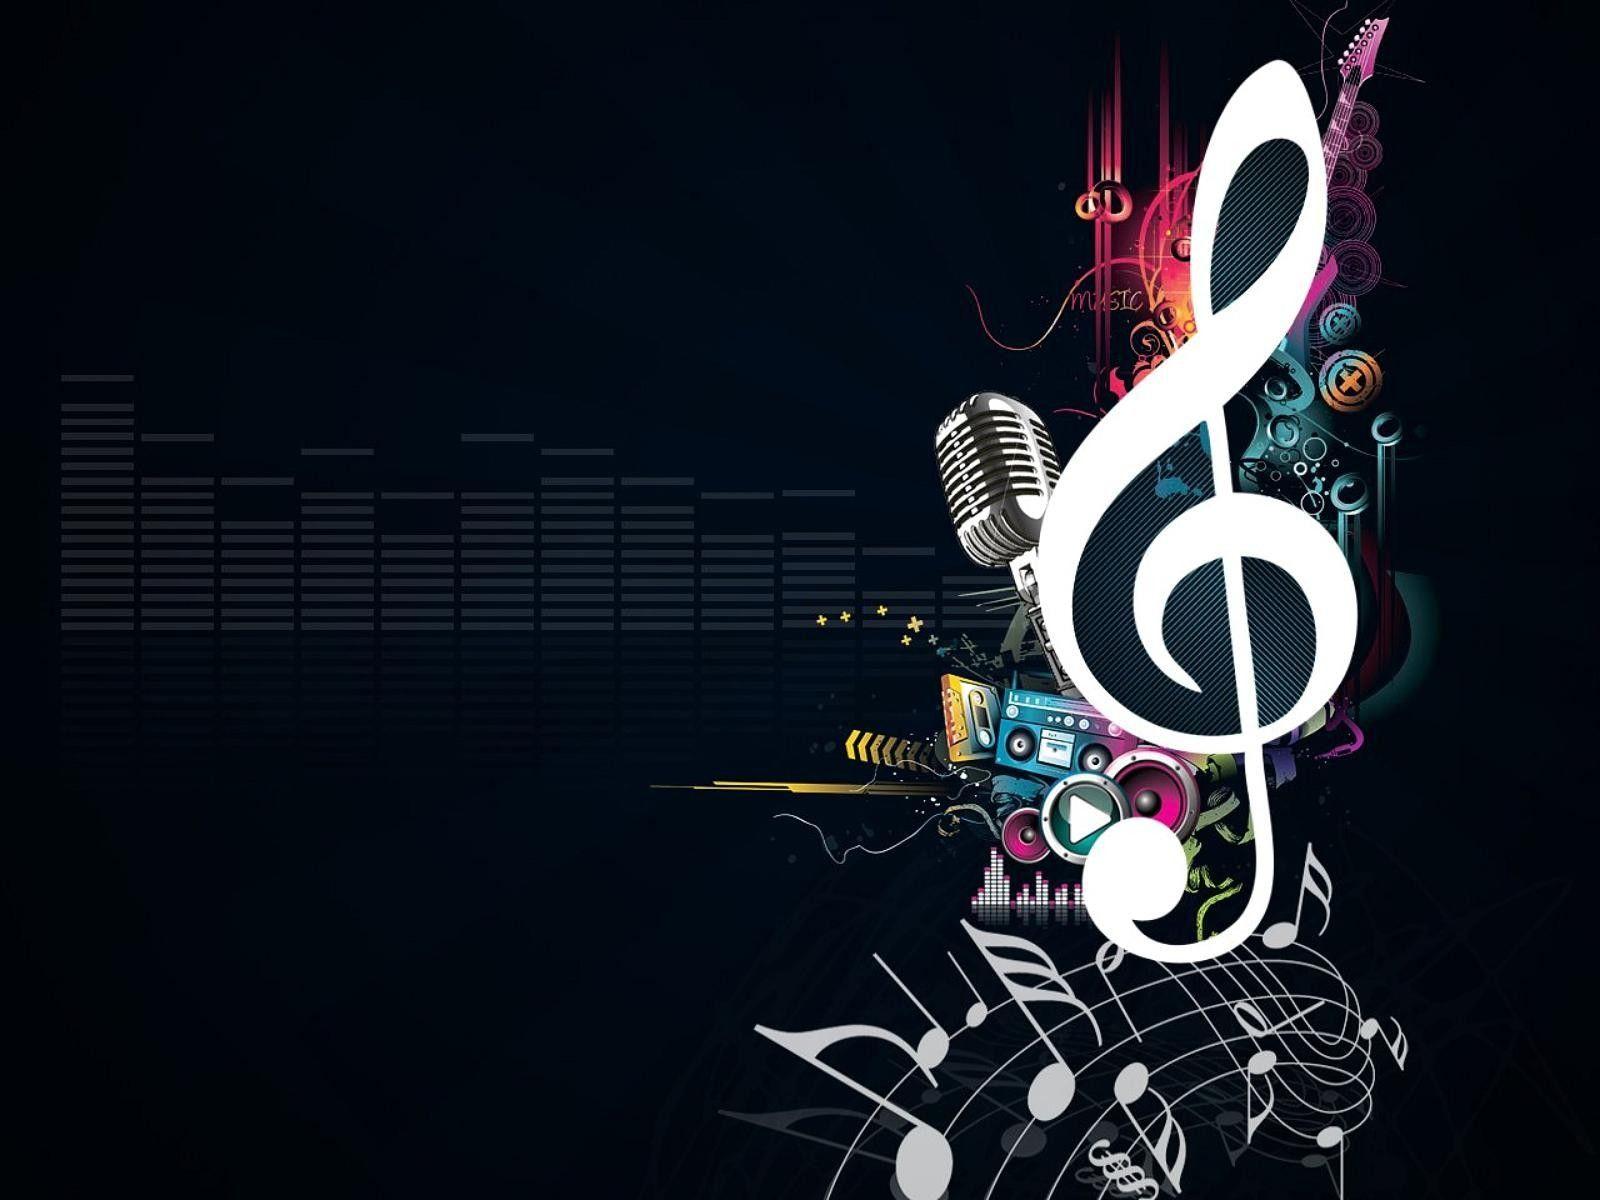 Fondos De Pantalla De Música Fondosmil